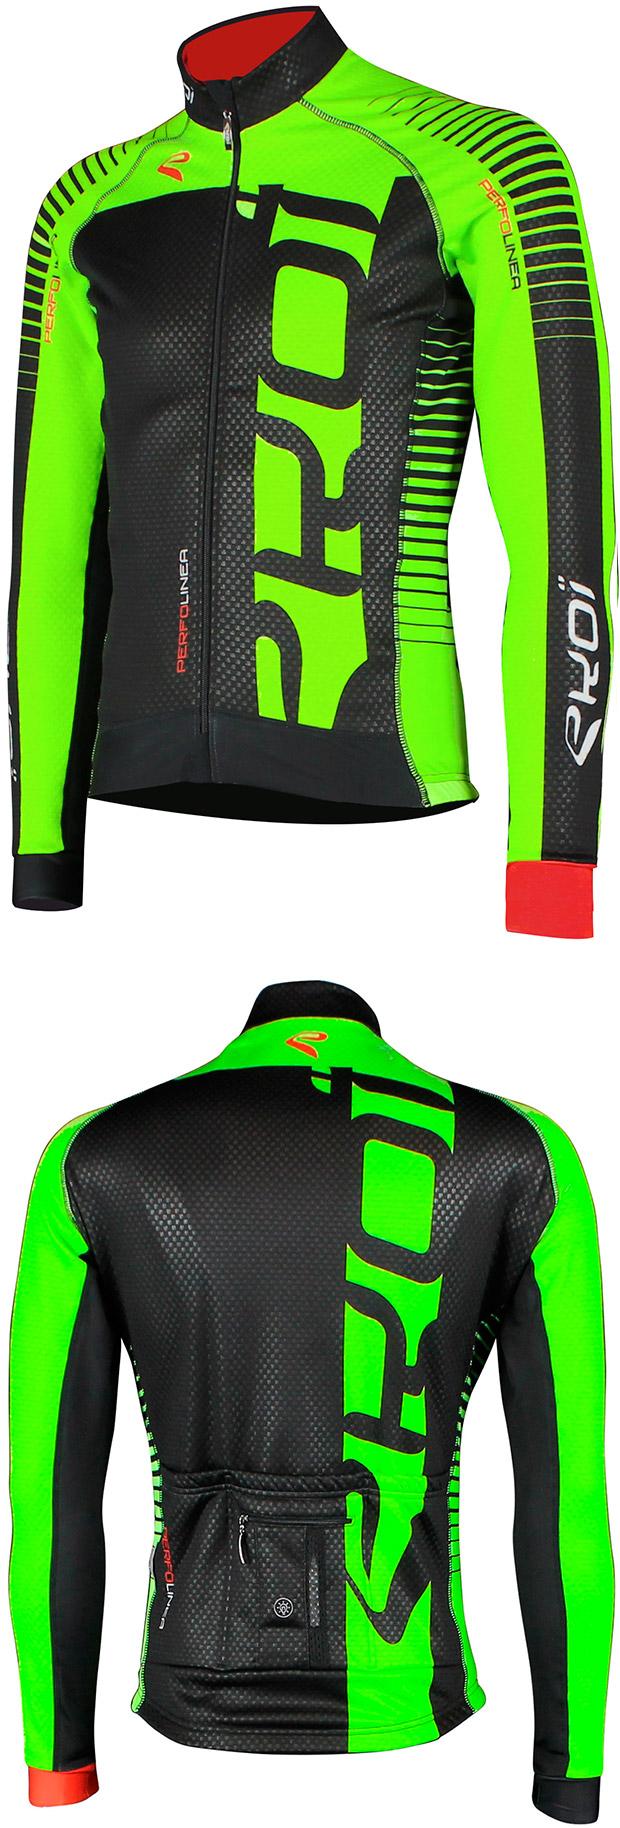 En TodoMountainBike: Ekoï LED: chaqueta, guantes y cascos para ciclistas con LEDs integrados